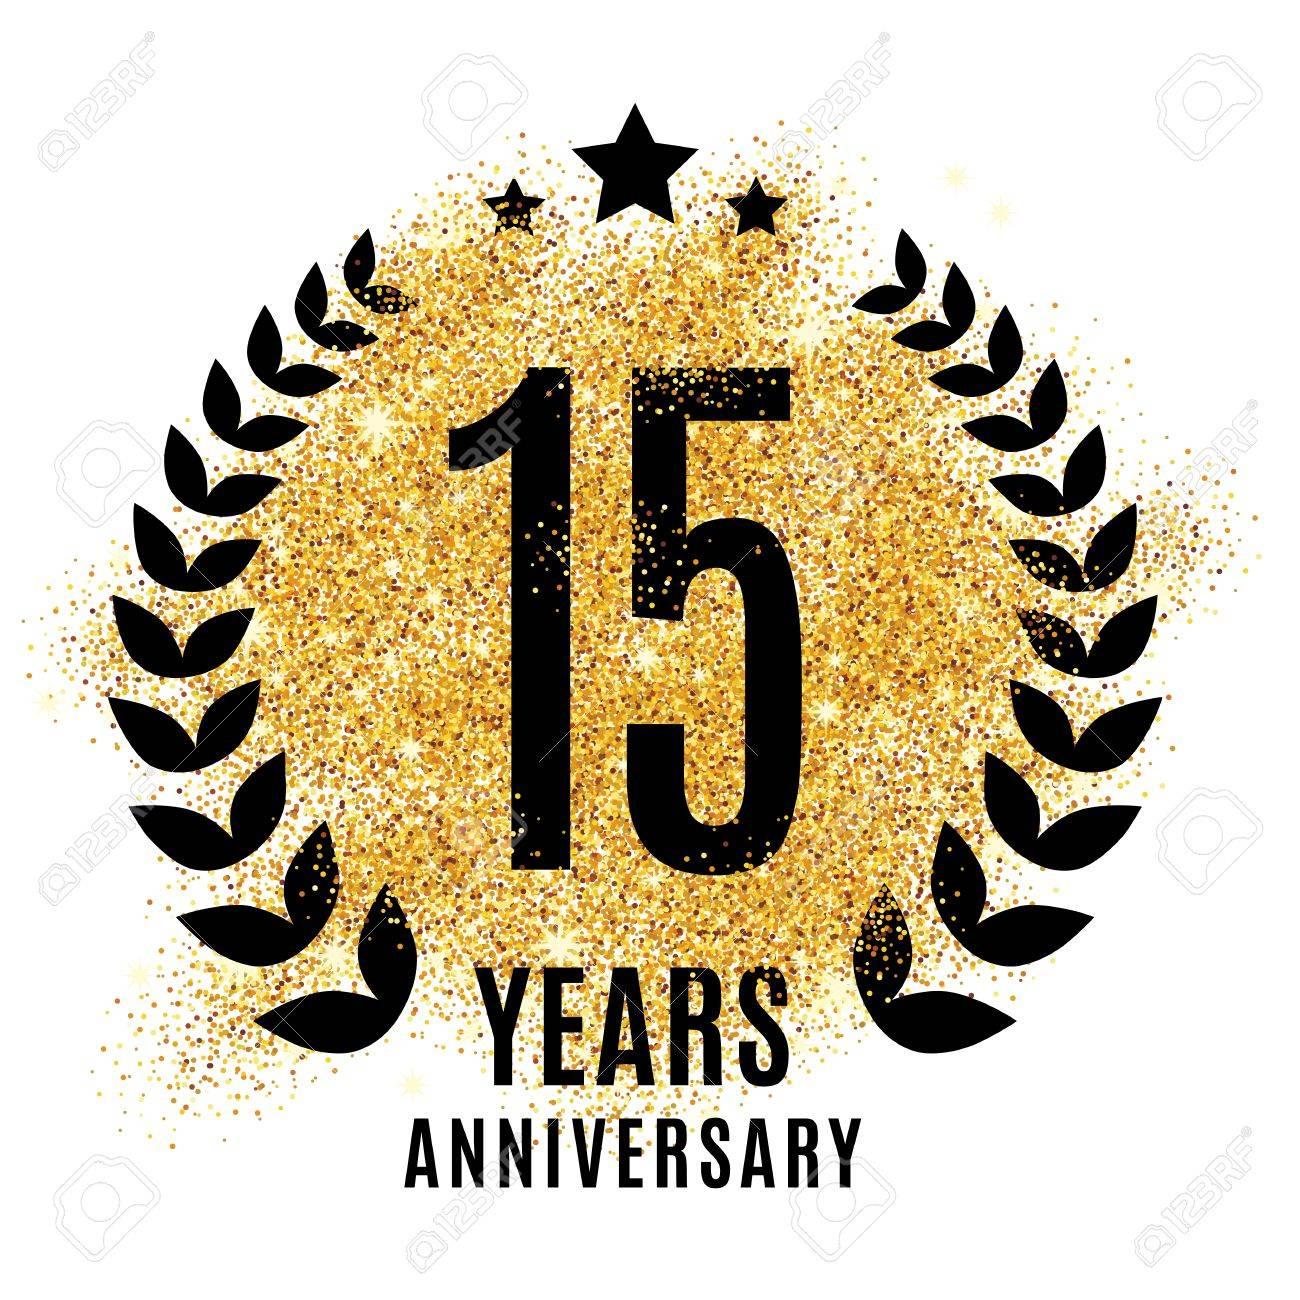 fifteen years golden anniversary sign. Gold glitter celebration. Light bright symbol for event, invitation, award, ceremony, greeting. Laurel and star emblem, luxury elegant icon. - 67585540